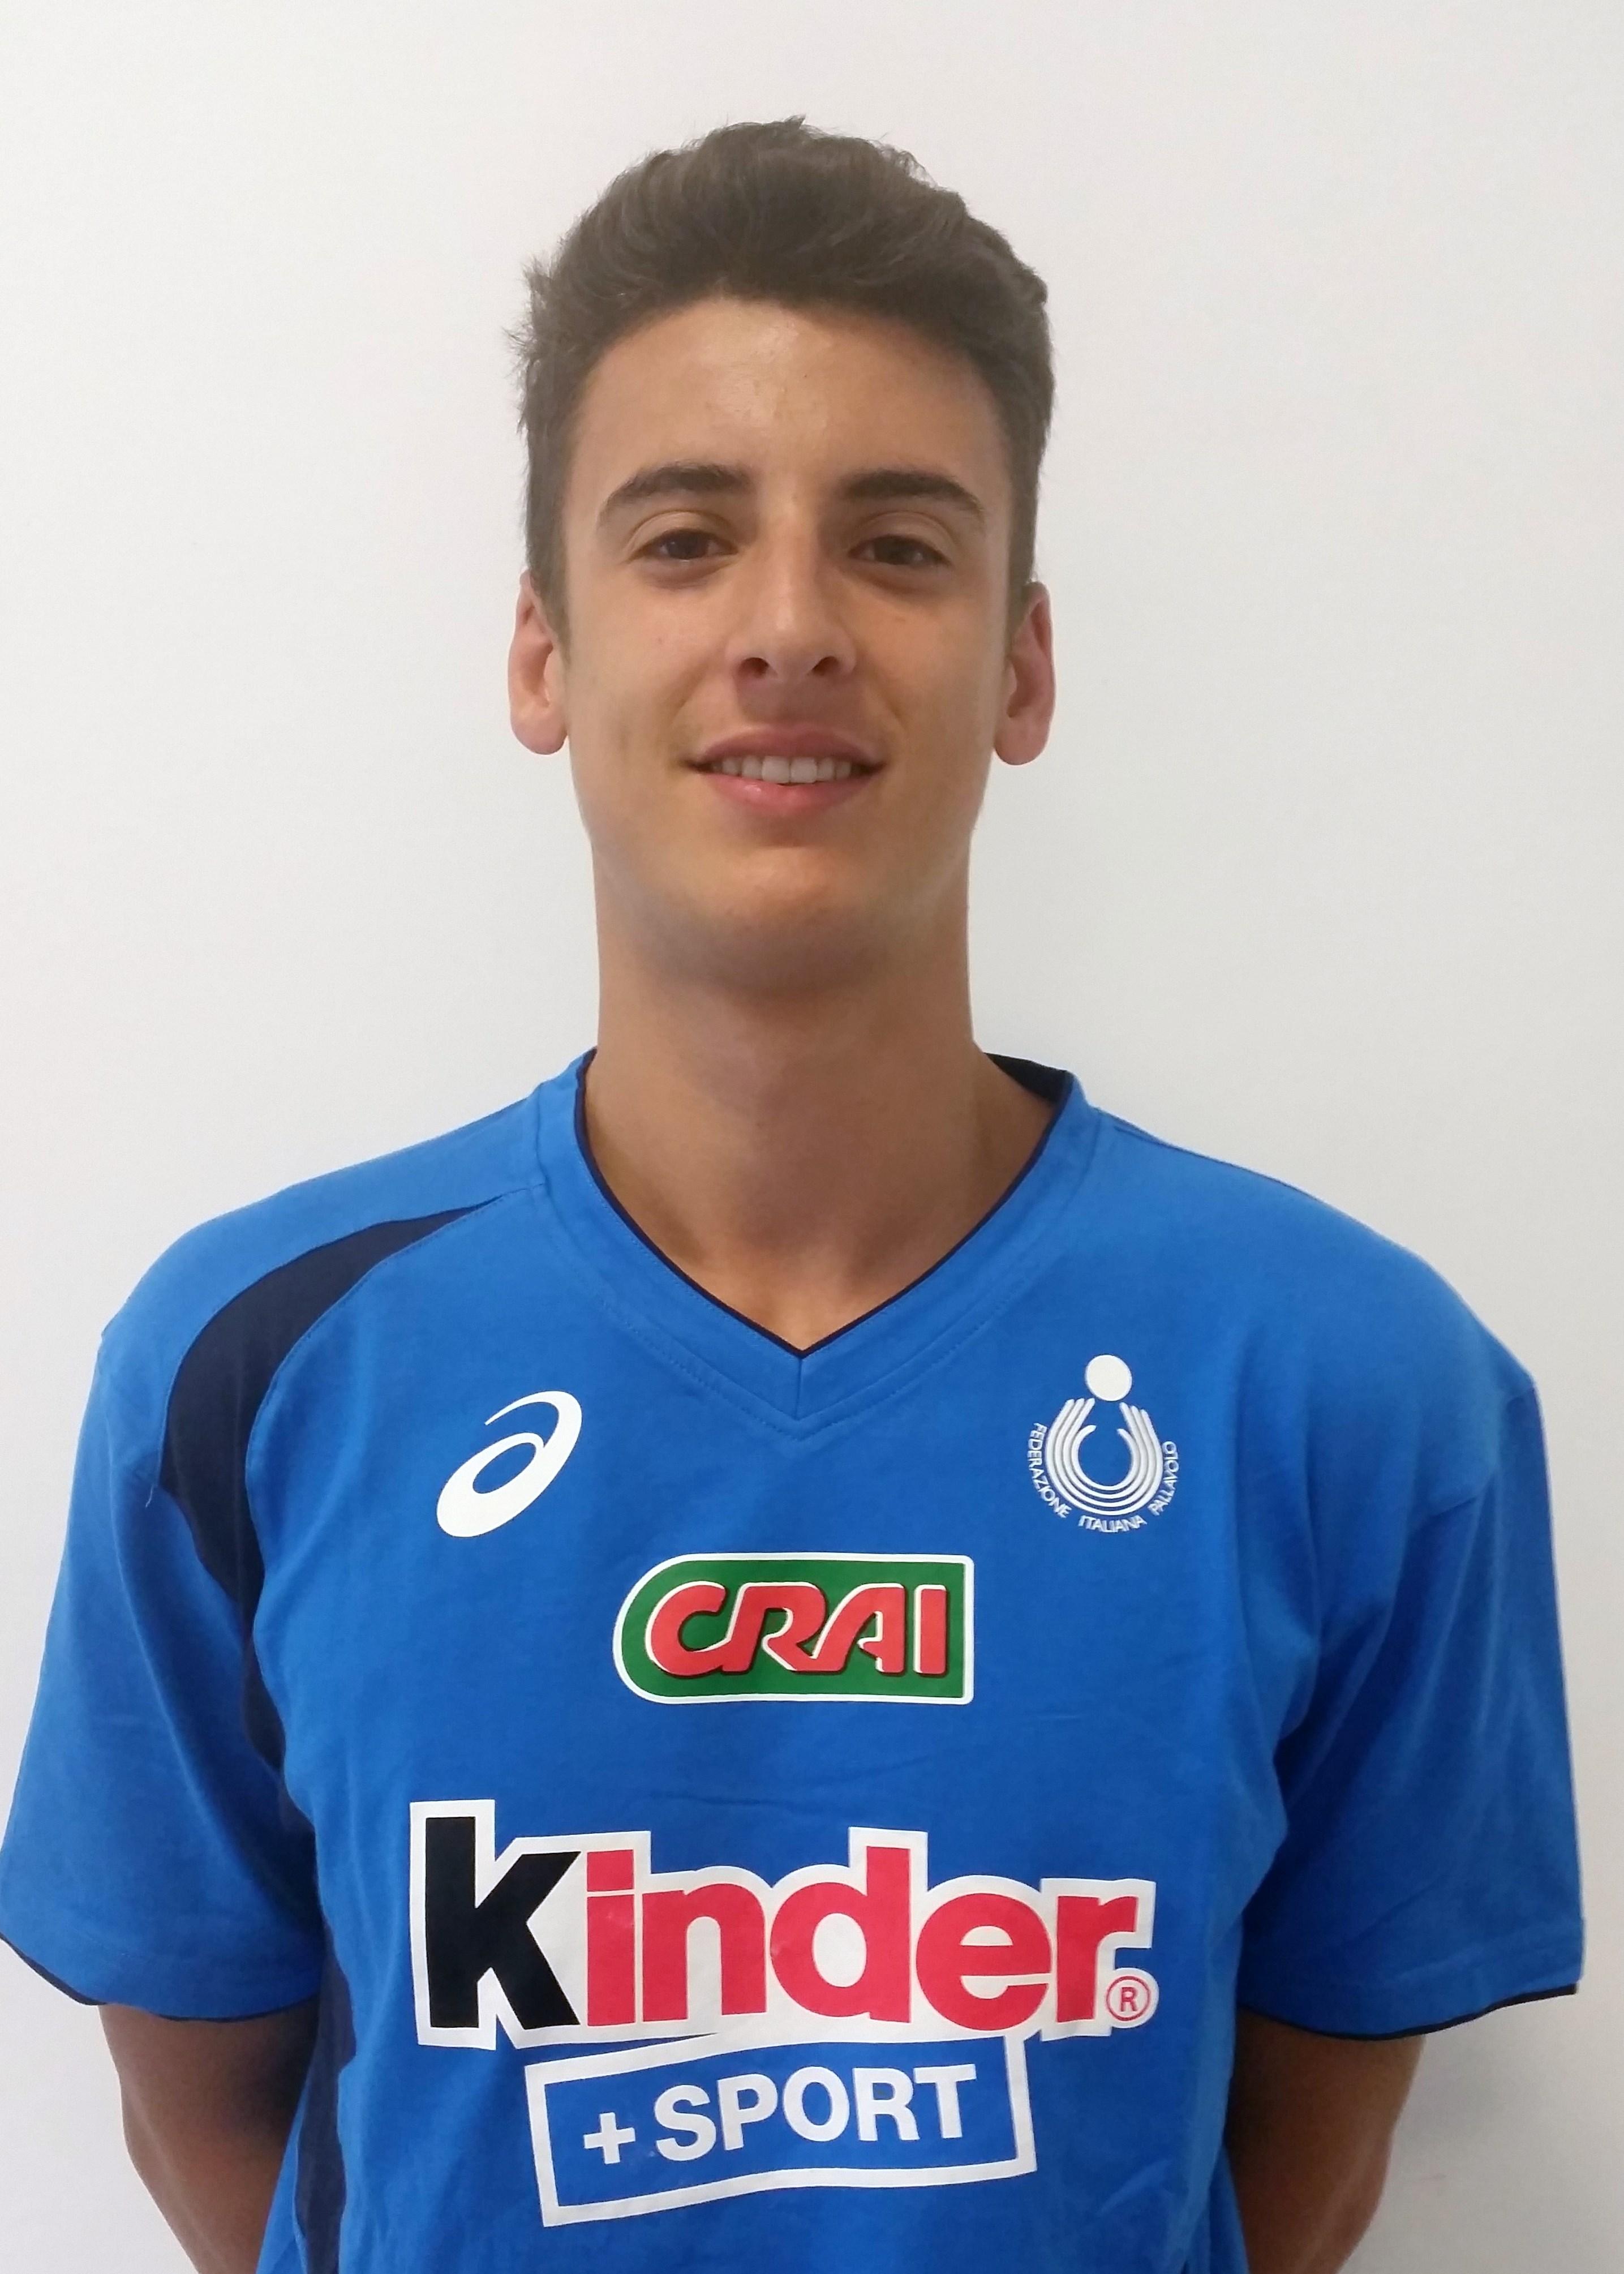 Paolo Zonca